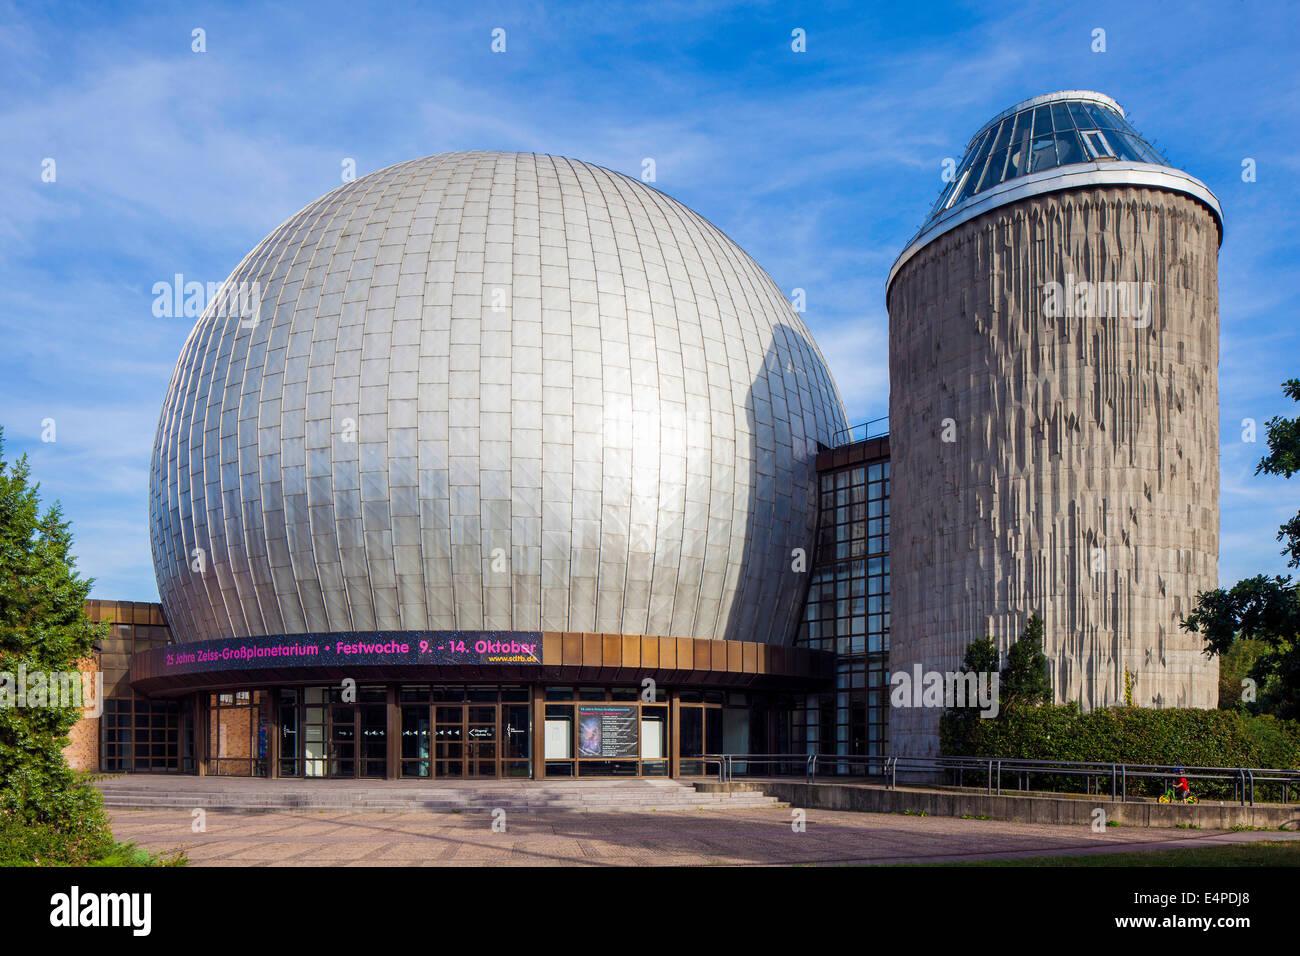 Zeiss Major Planetarium, Ernst-Thälmann-Park, Prenzlauer Berg, Berlin, Germany - Stock Image